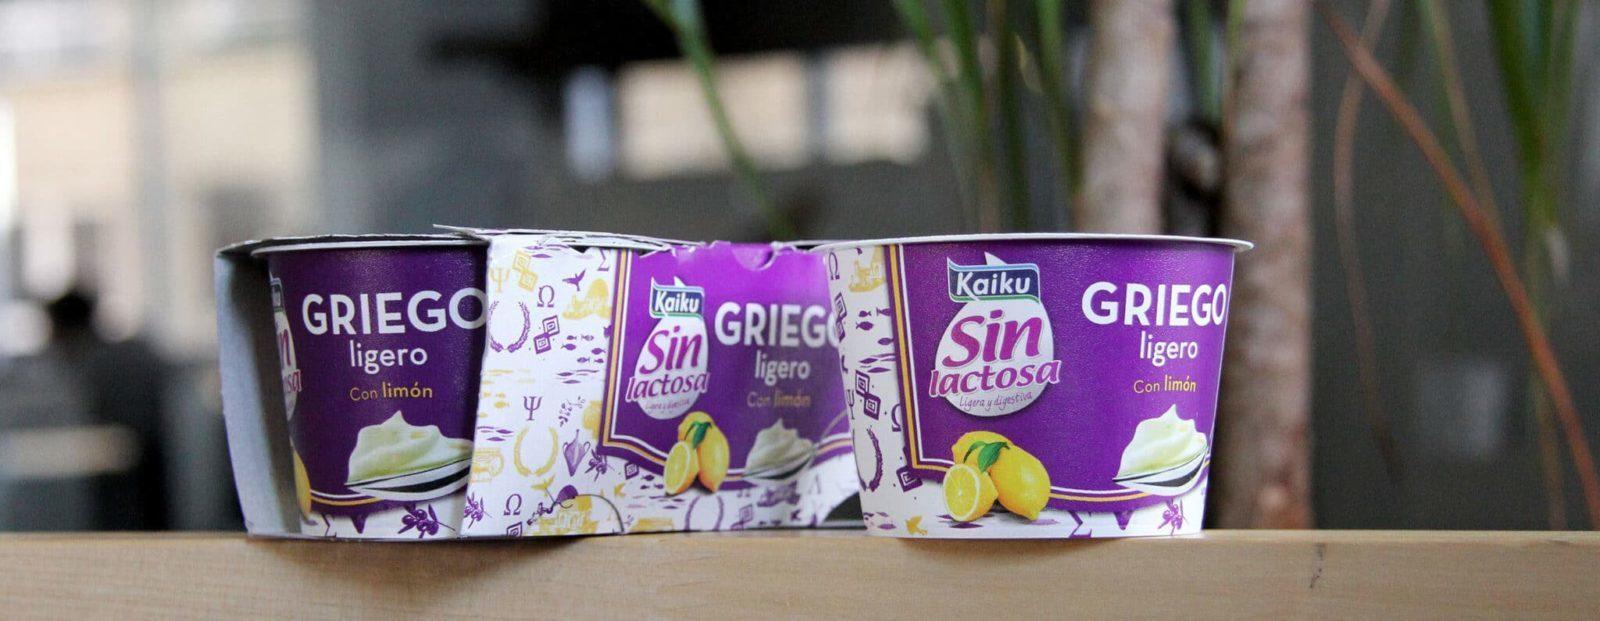 diseño de packaging alimenticio kaiku